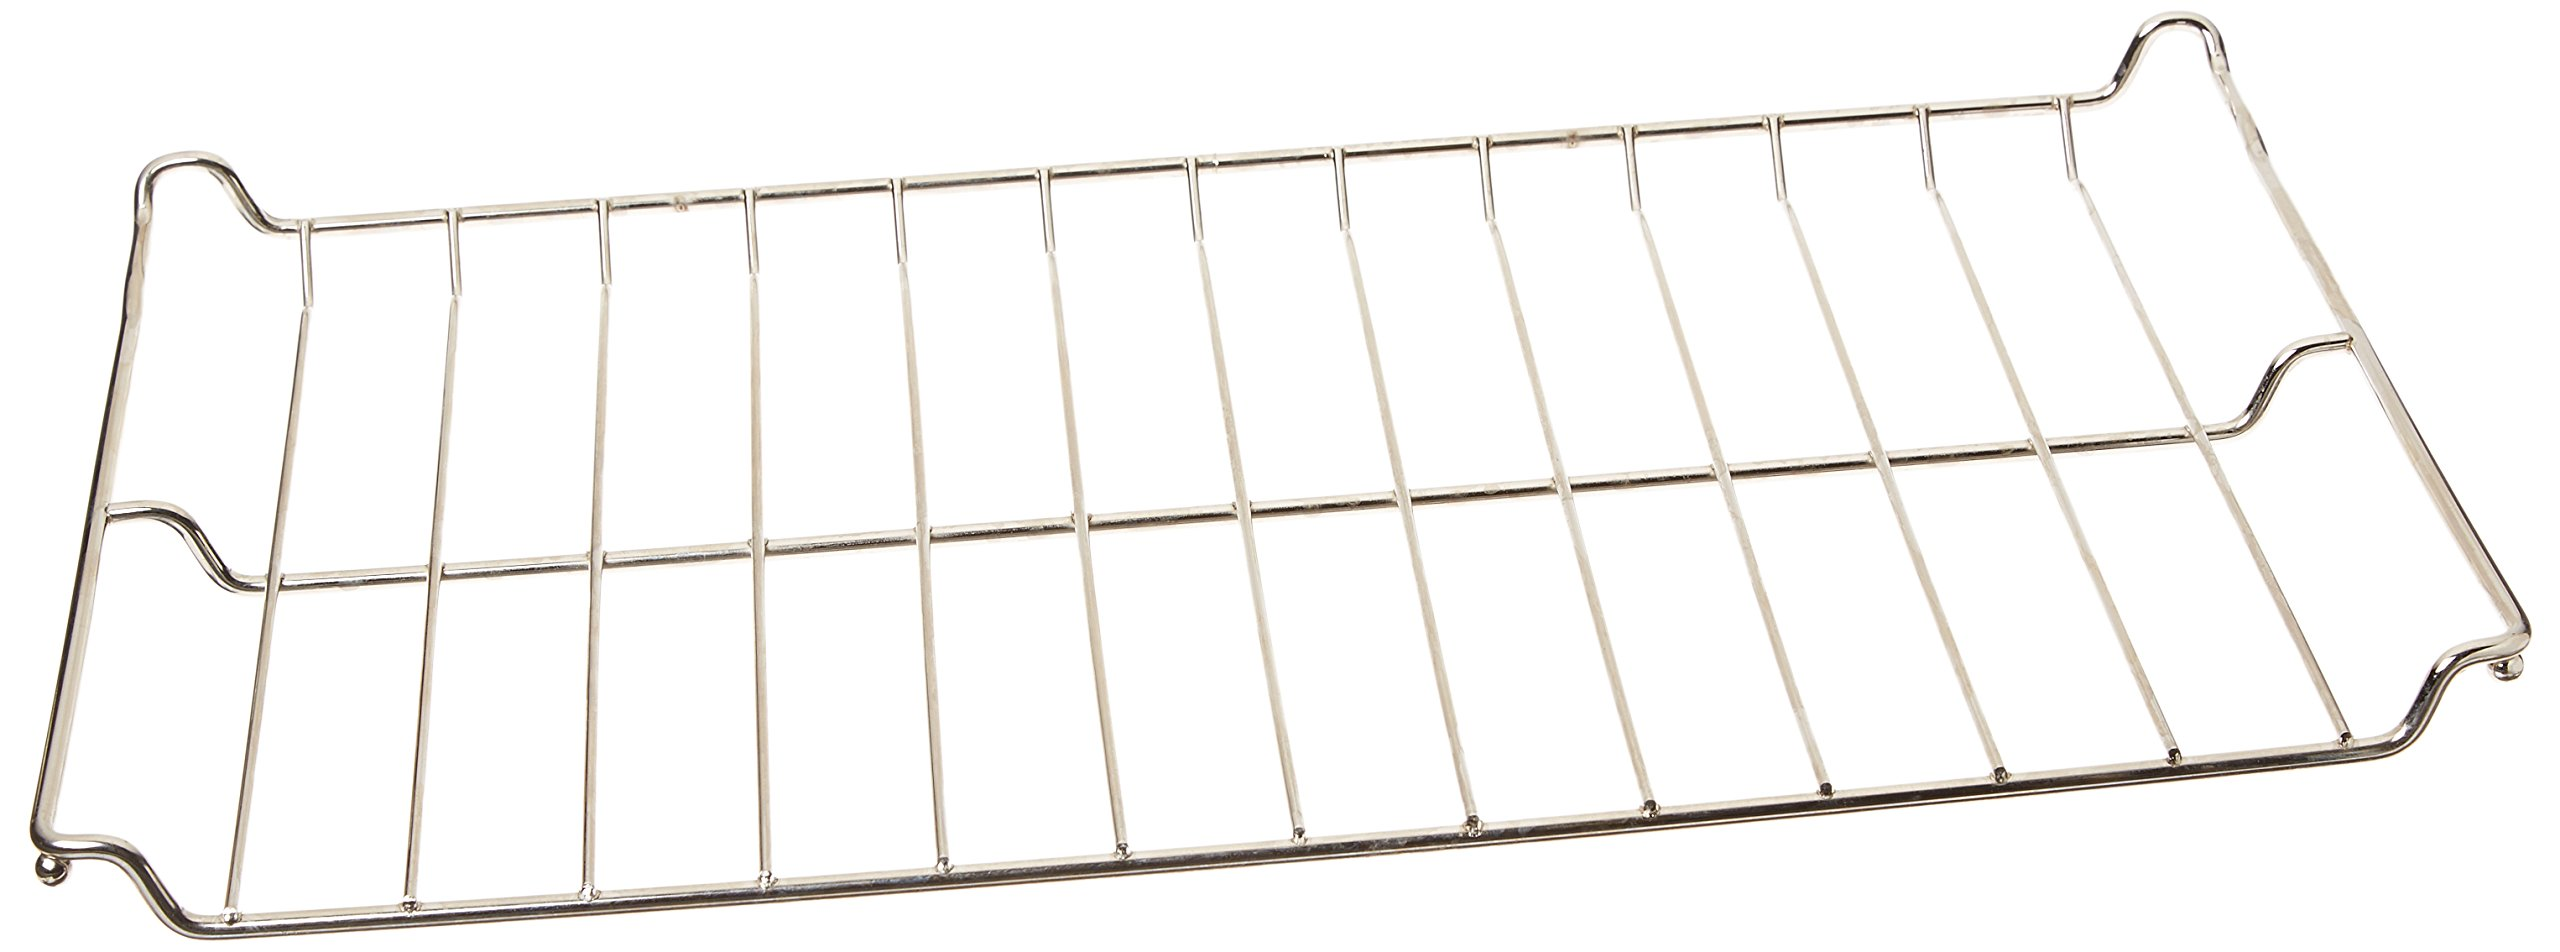 Frigidaire 316425700 Range/Stove/Oven Rack Unit by Frigidaire